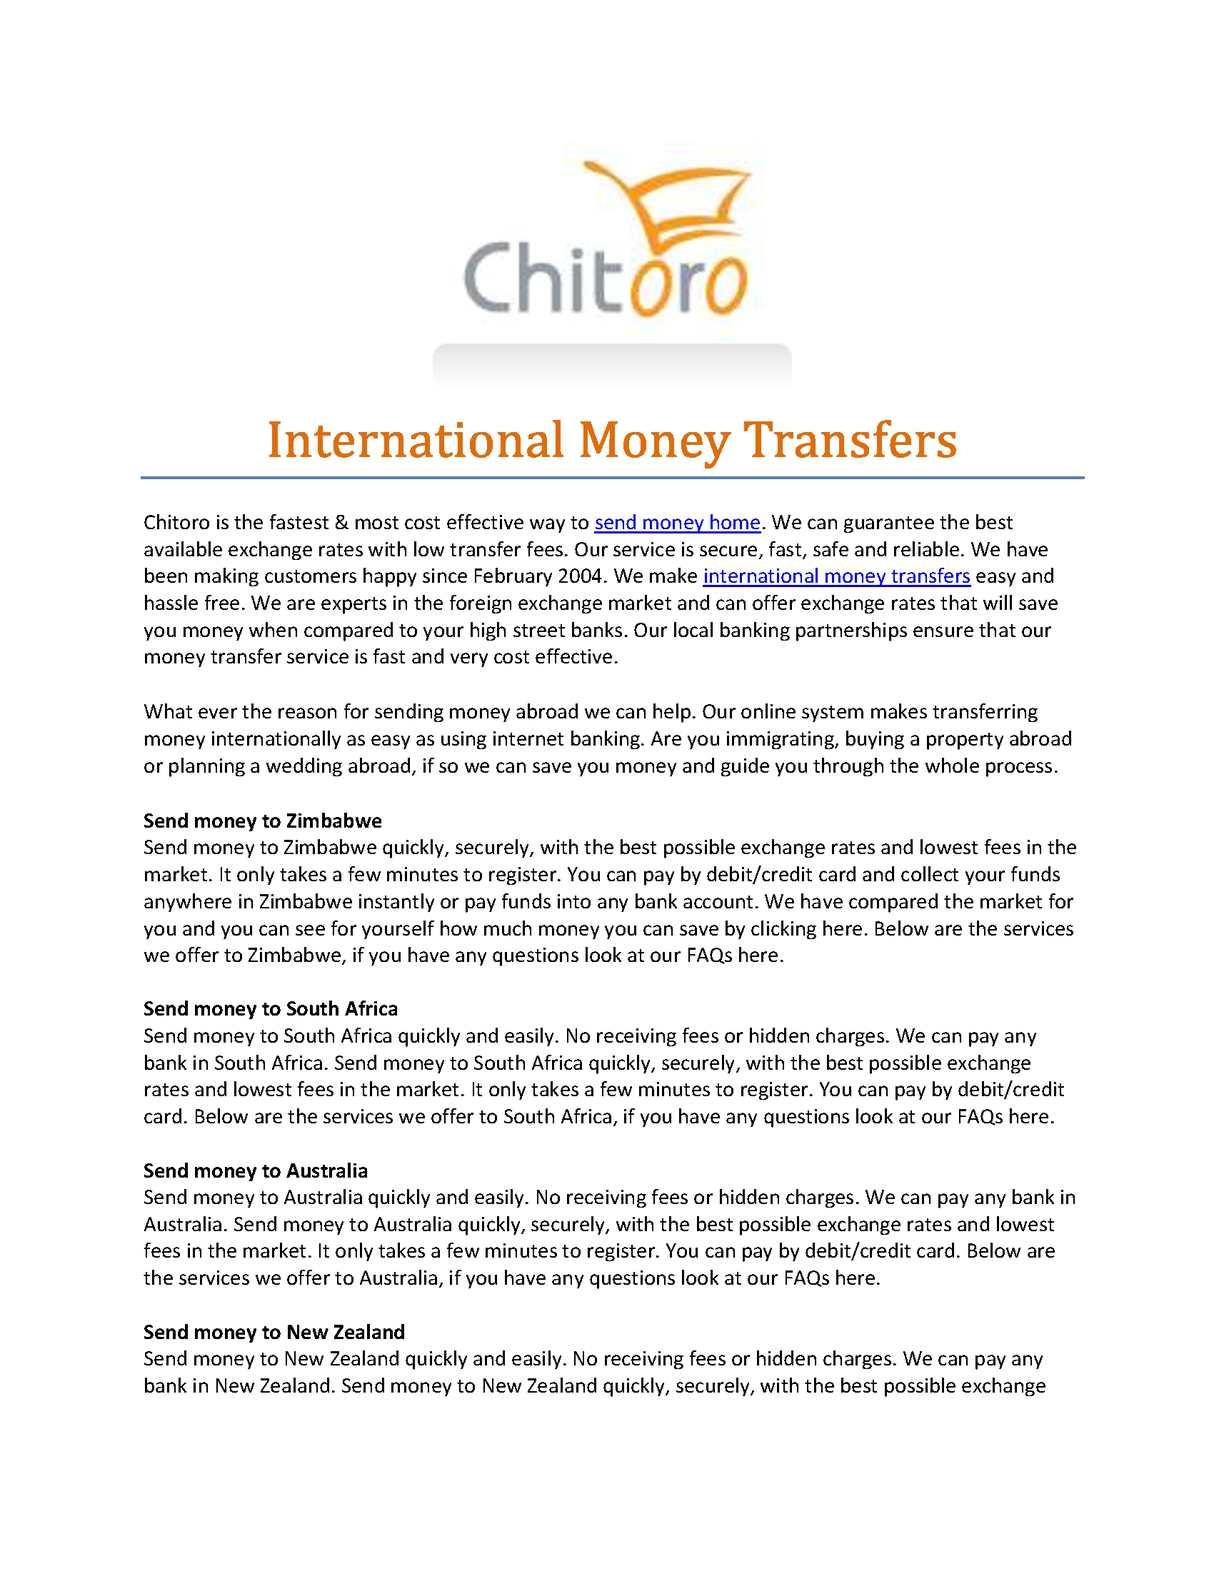 Calaméo - International Money Transfers